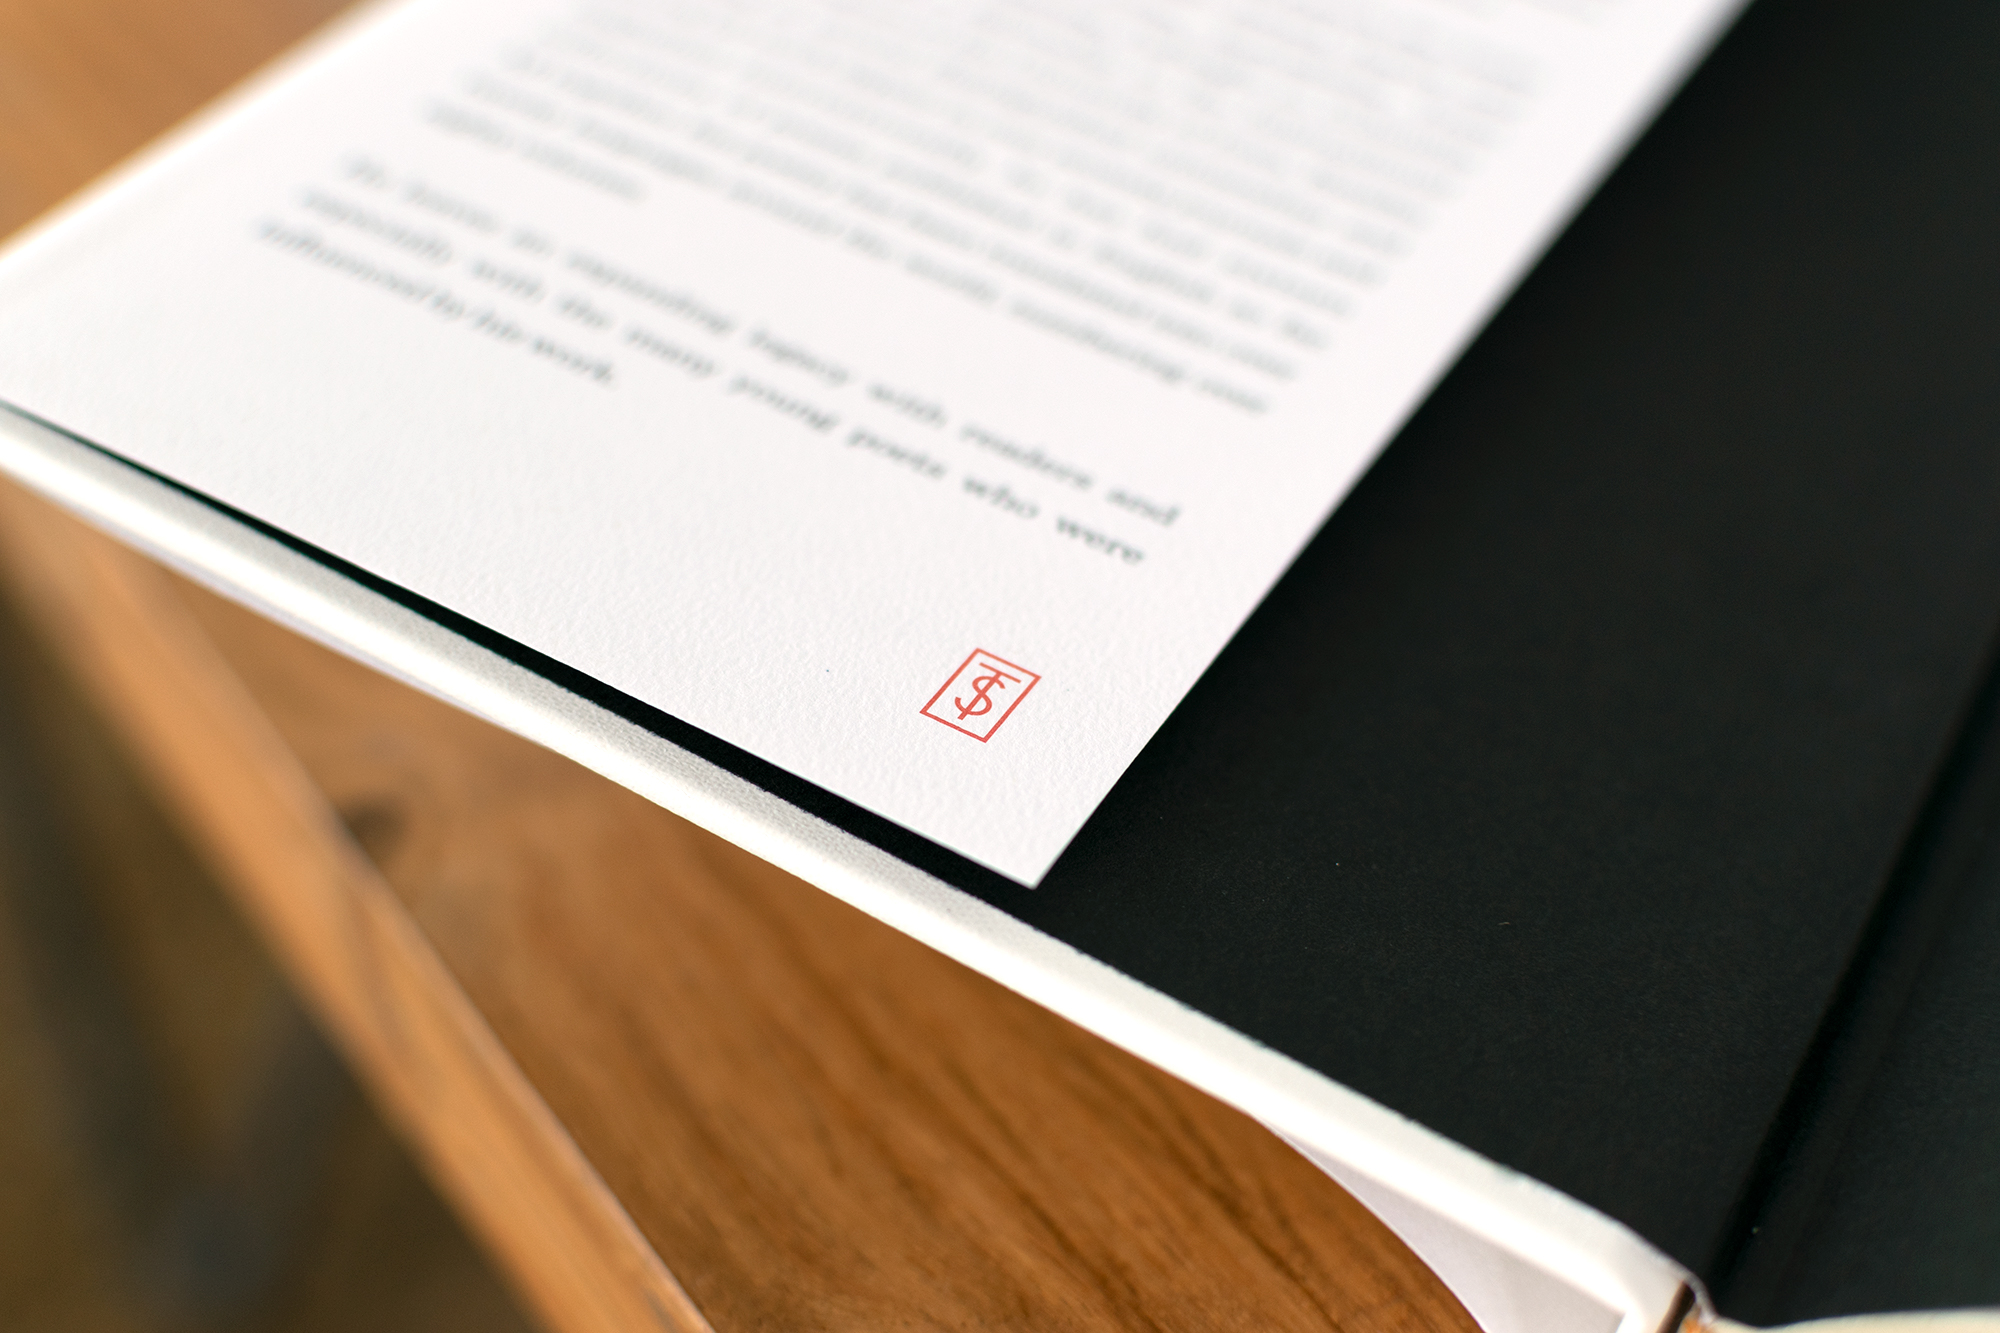 Custom monogram for Tomaz Salamun book series designed by Abby Haddican.